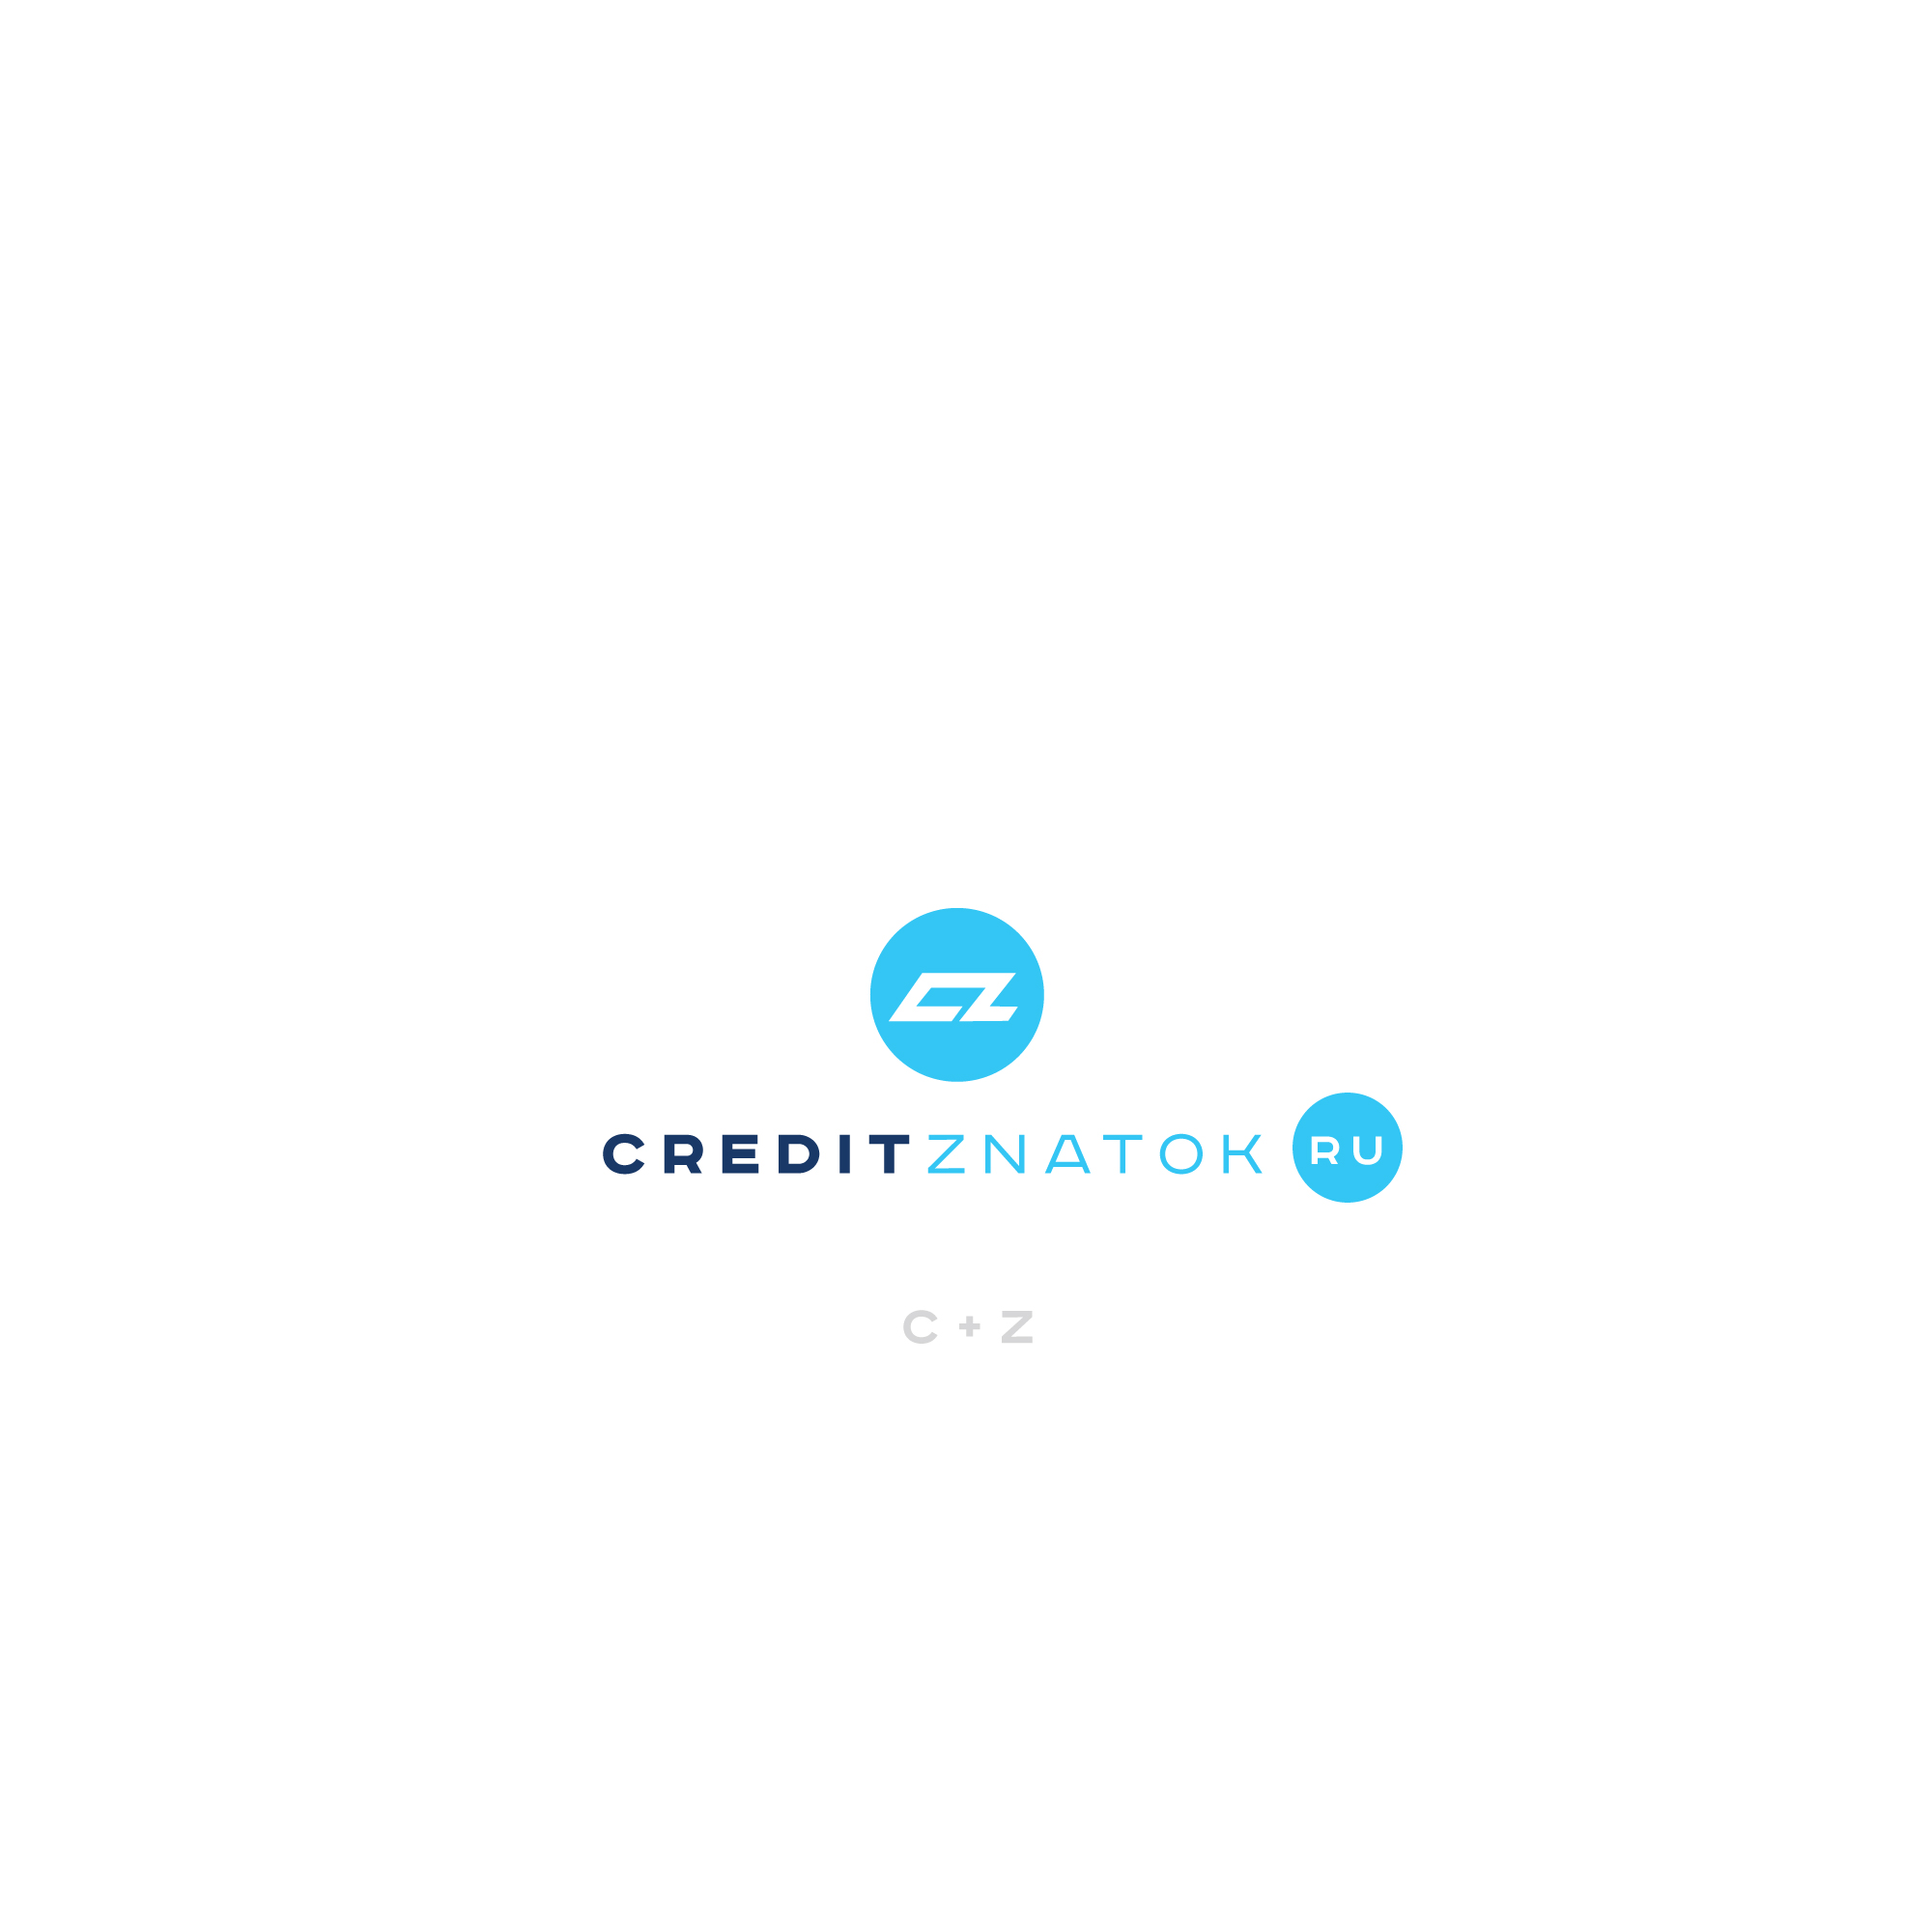 creditznatok.ru - логотип фото f_3235899a1e38f7e0.jpg